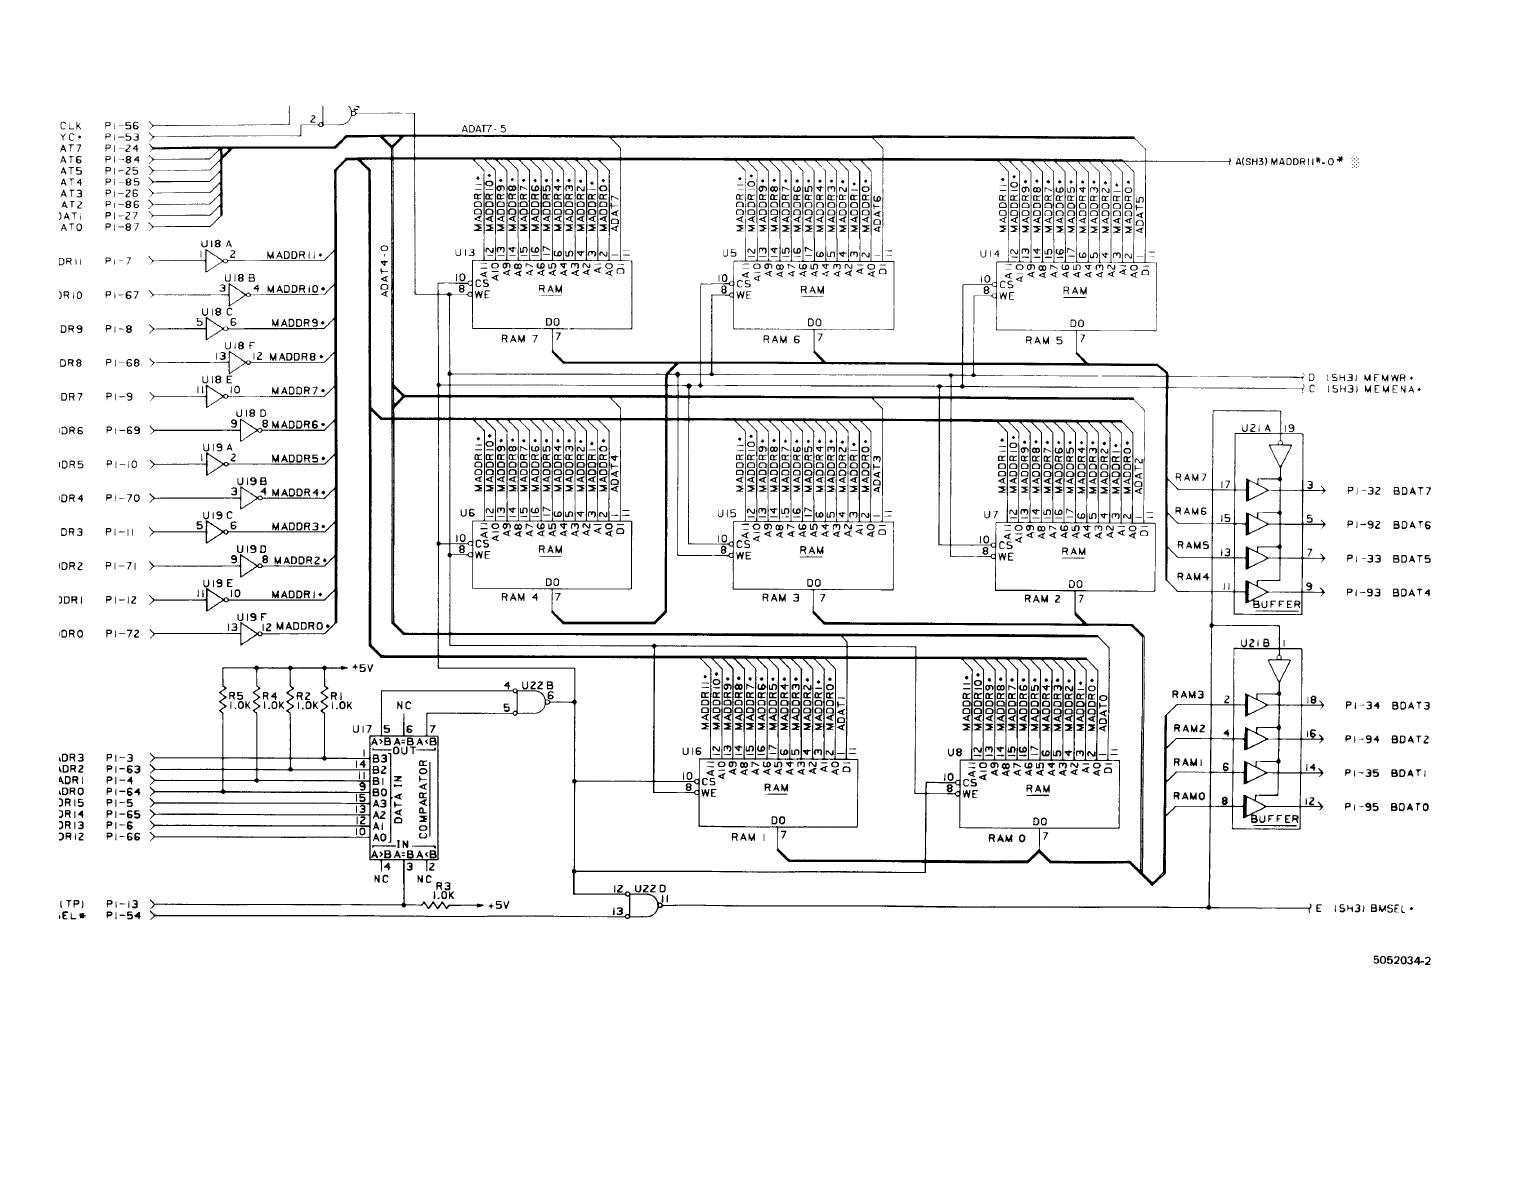 FO-14. 4K RAM CCA (A11), Schematic Diagram ( Sheet 2 of 3 )